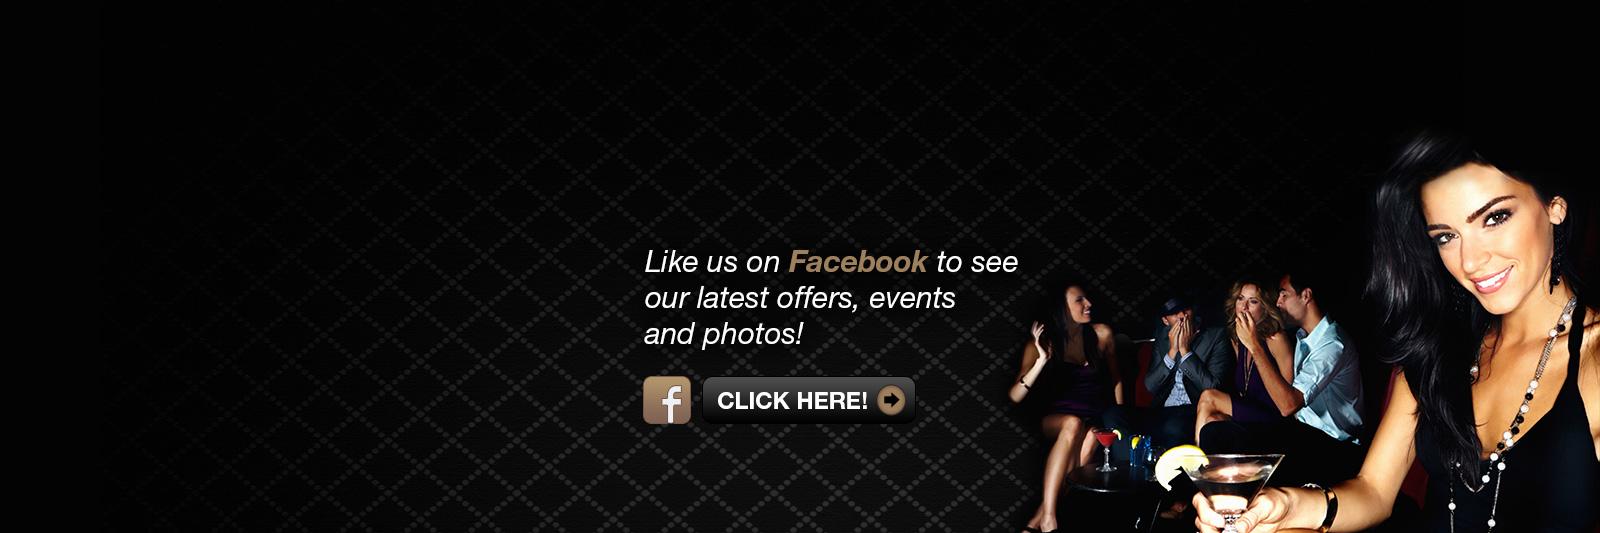 Like us con Facebook